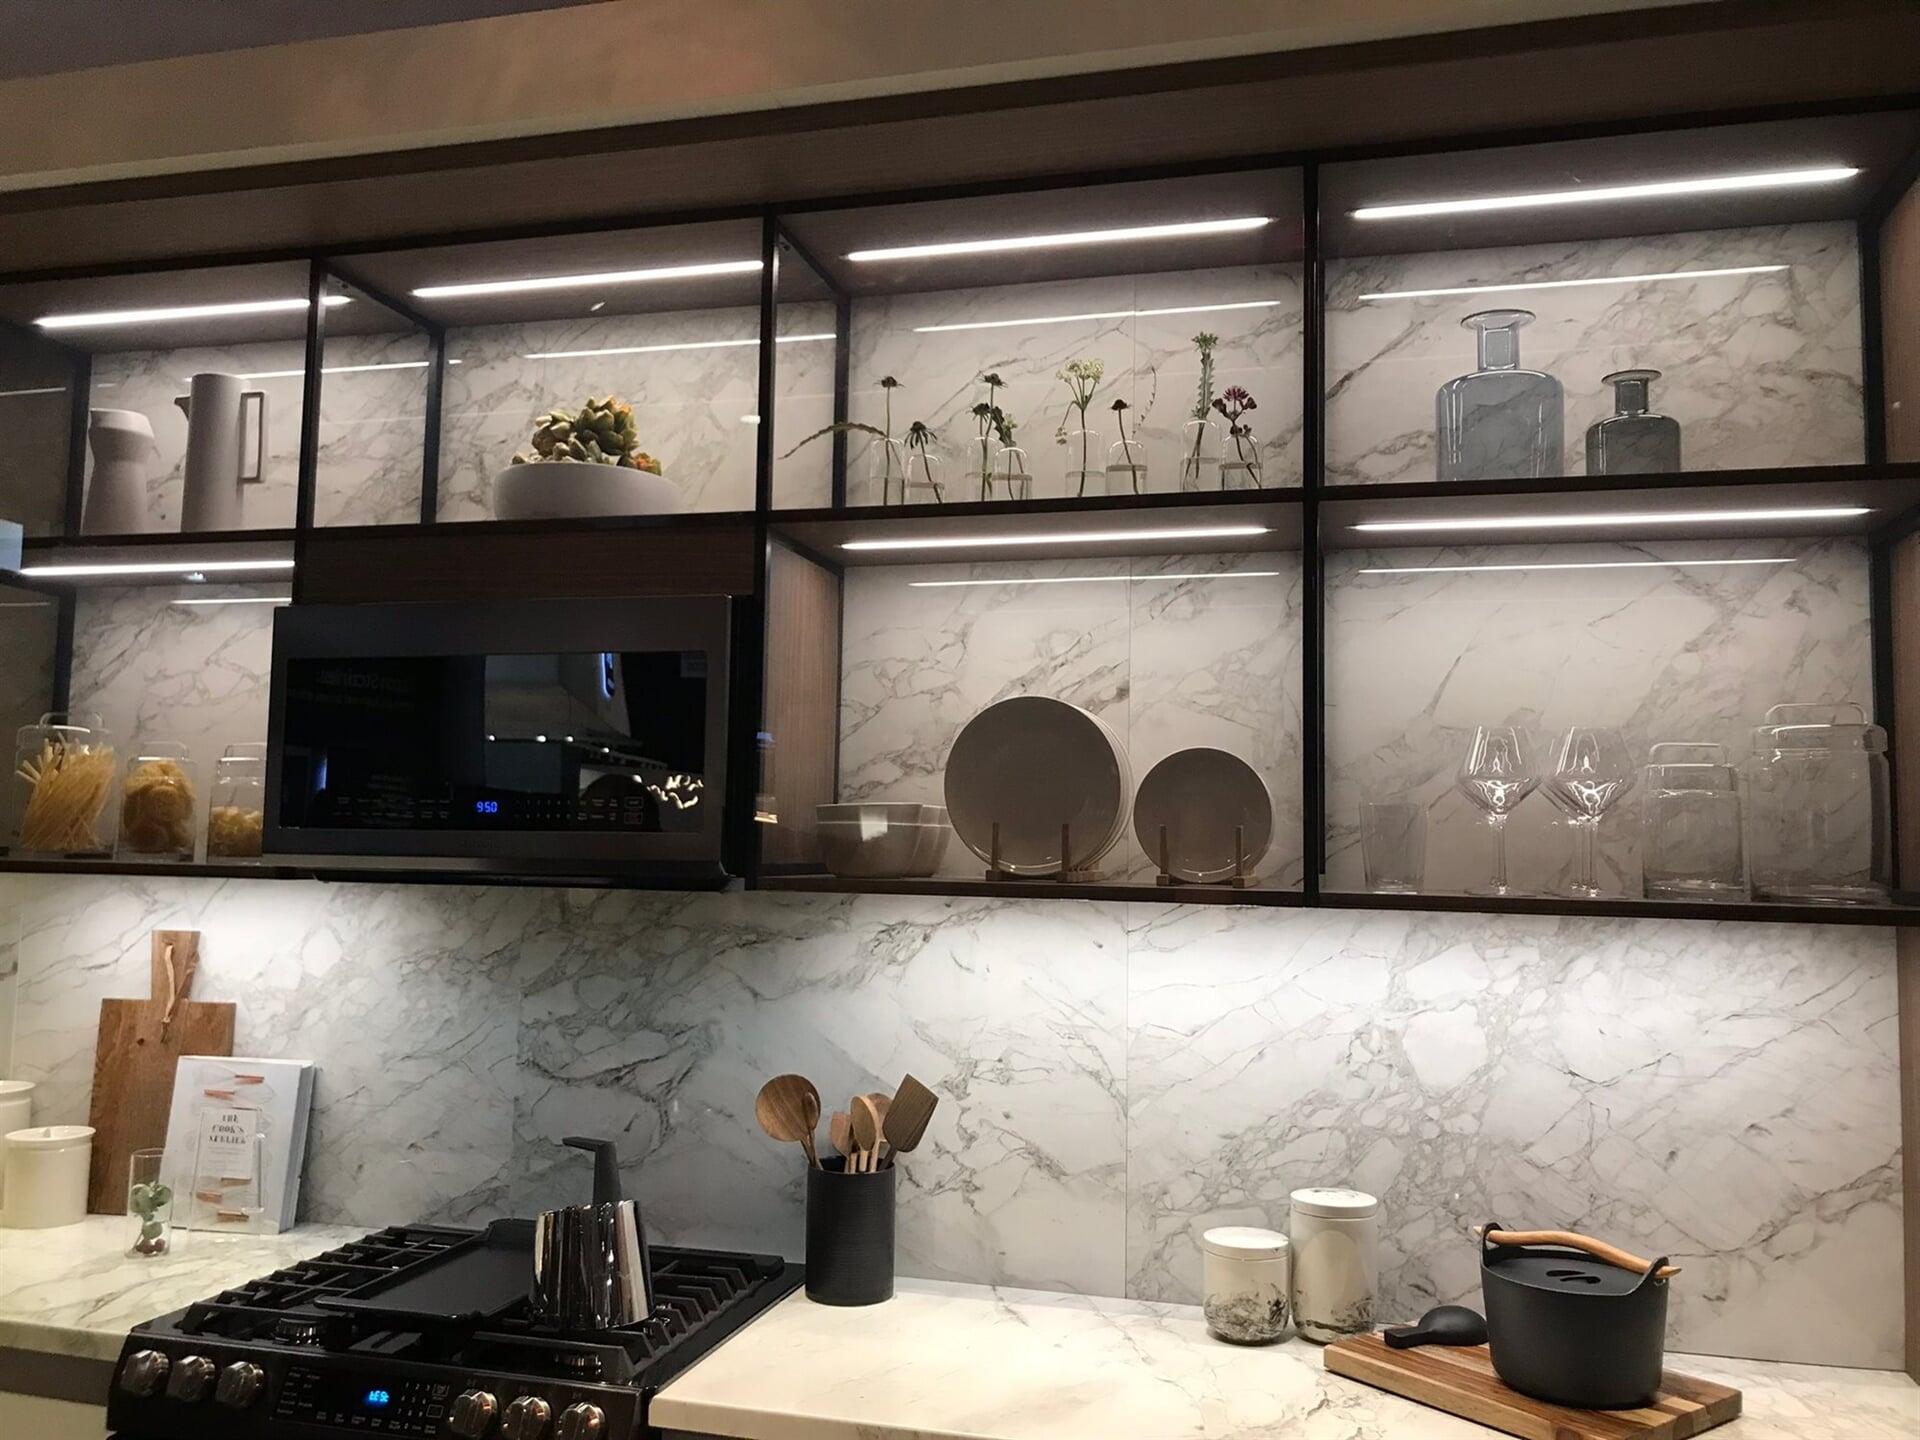 Marble backsplash wall in Boca Roton, FL from Floors For You Kitchen & Bath